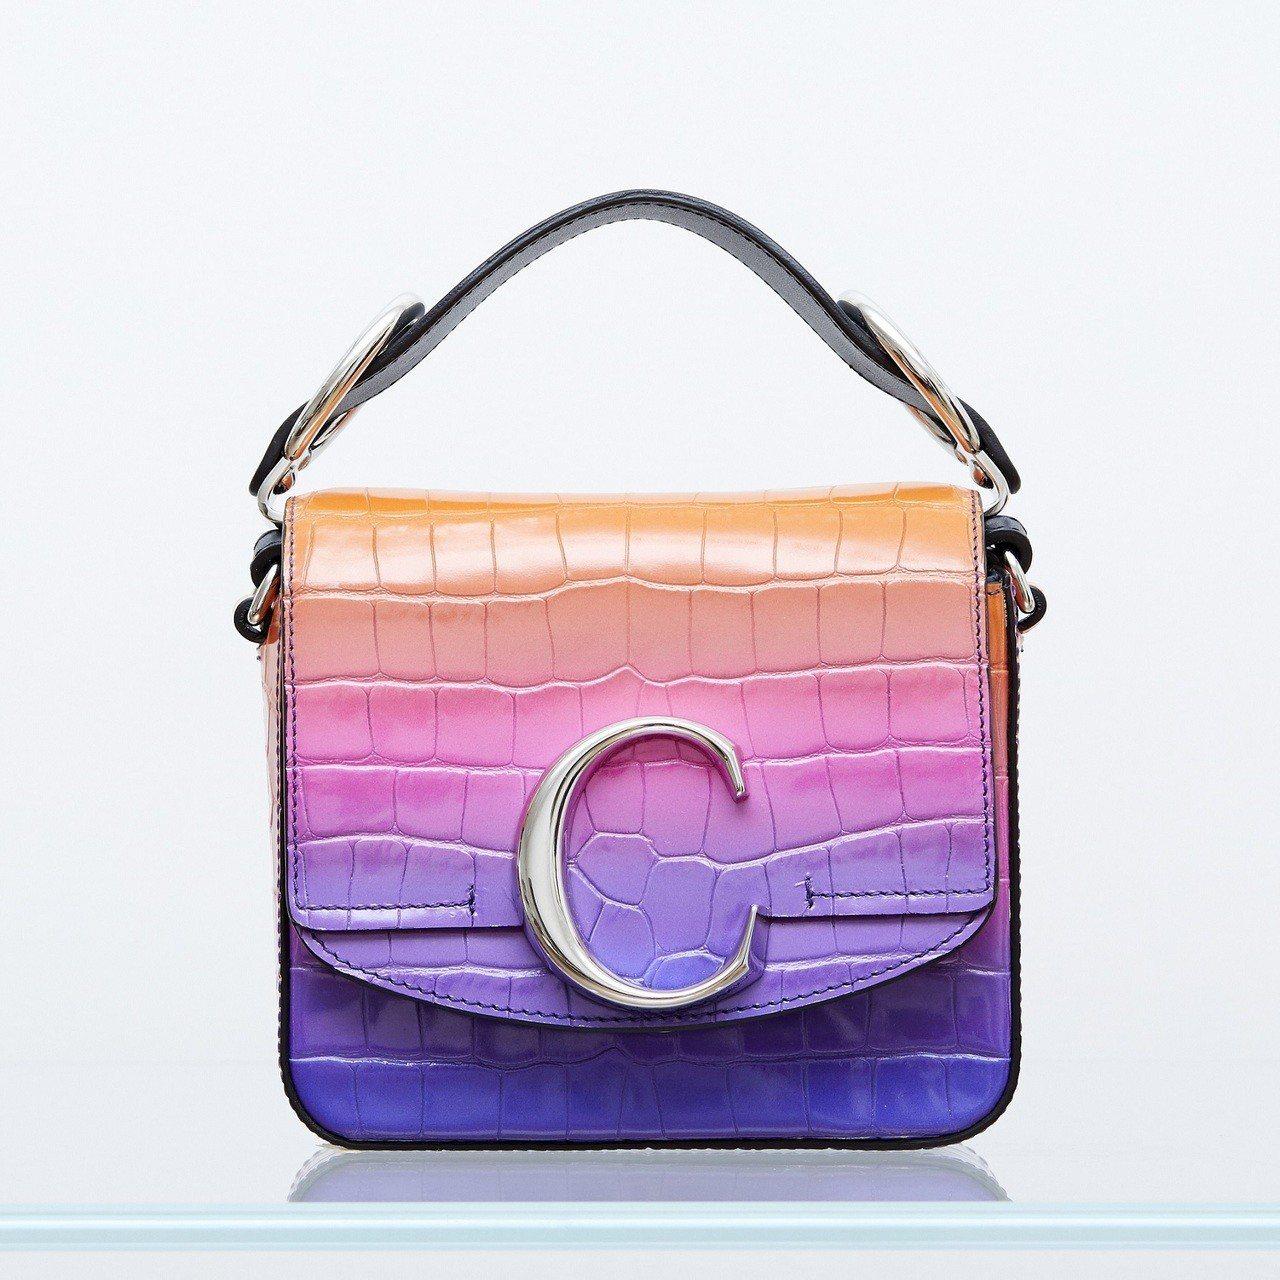 Chloé C Mini漸層螢光色肩背手提兩用包,售價52,500元。圖/Ch...